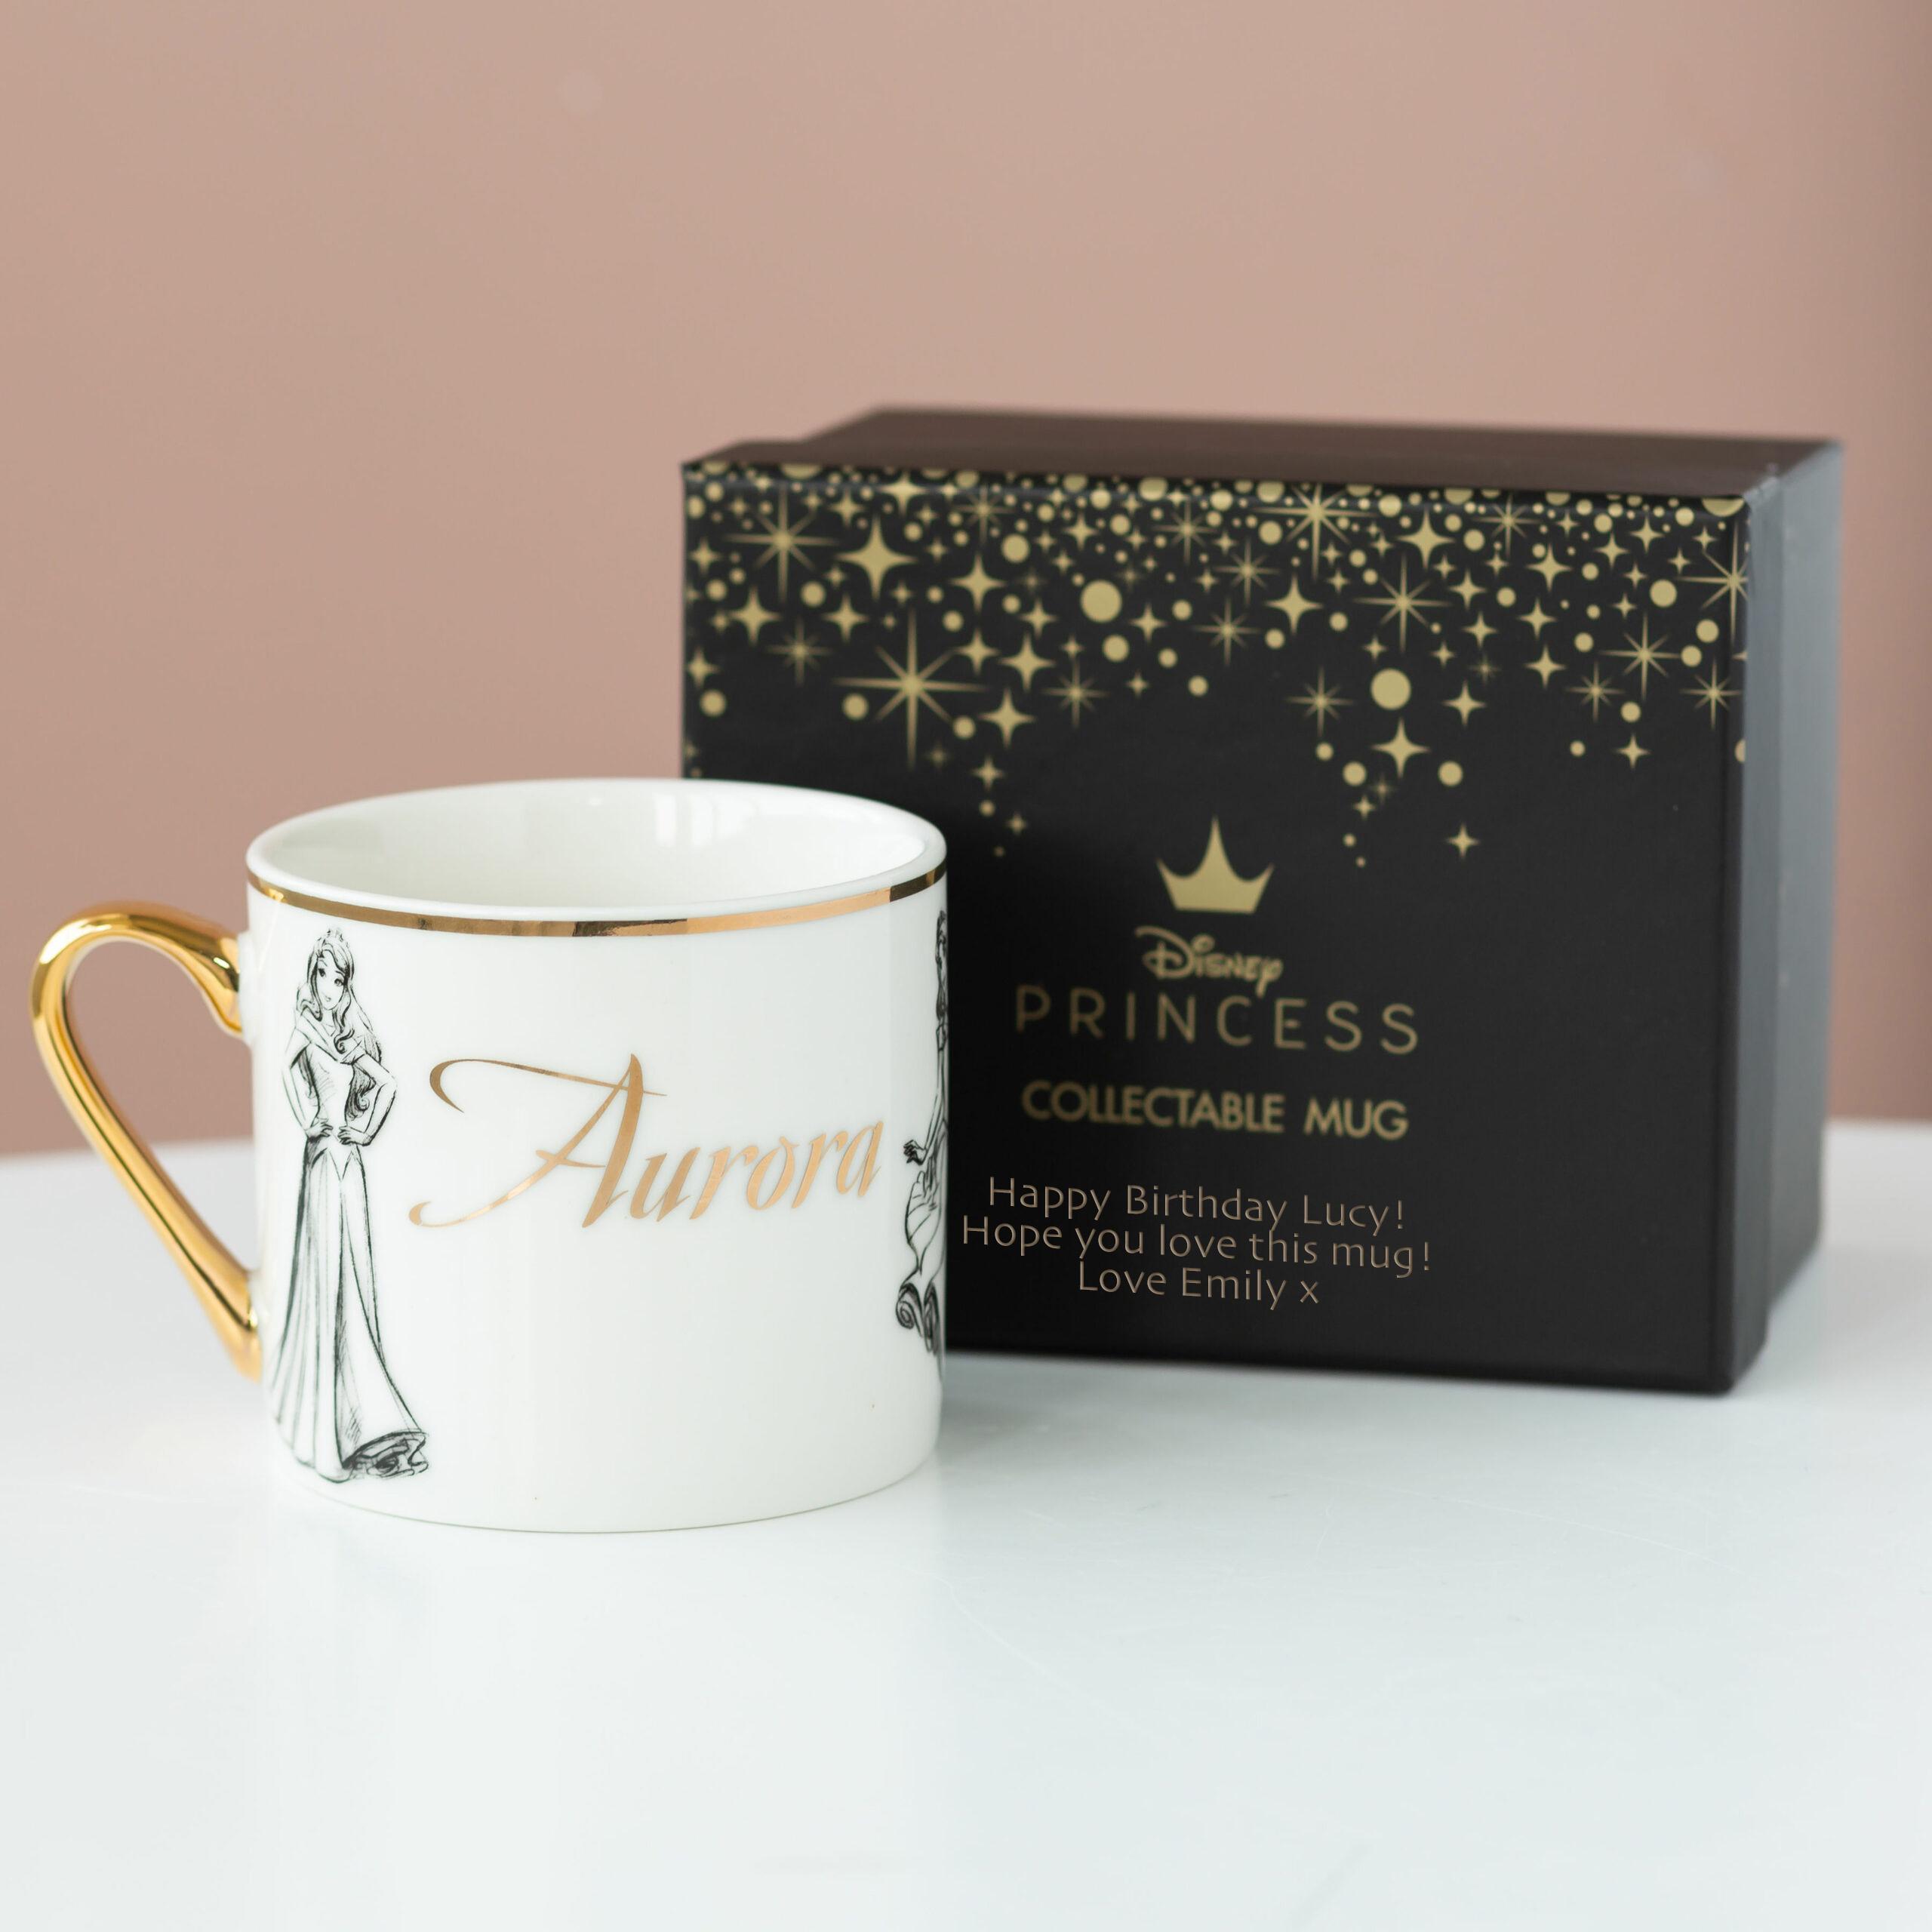 Aurora Disney Limited Edition Mug with Personalised Gift Box